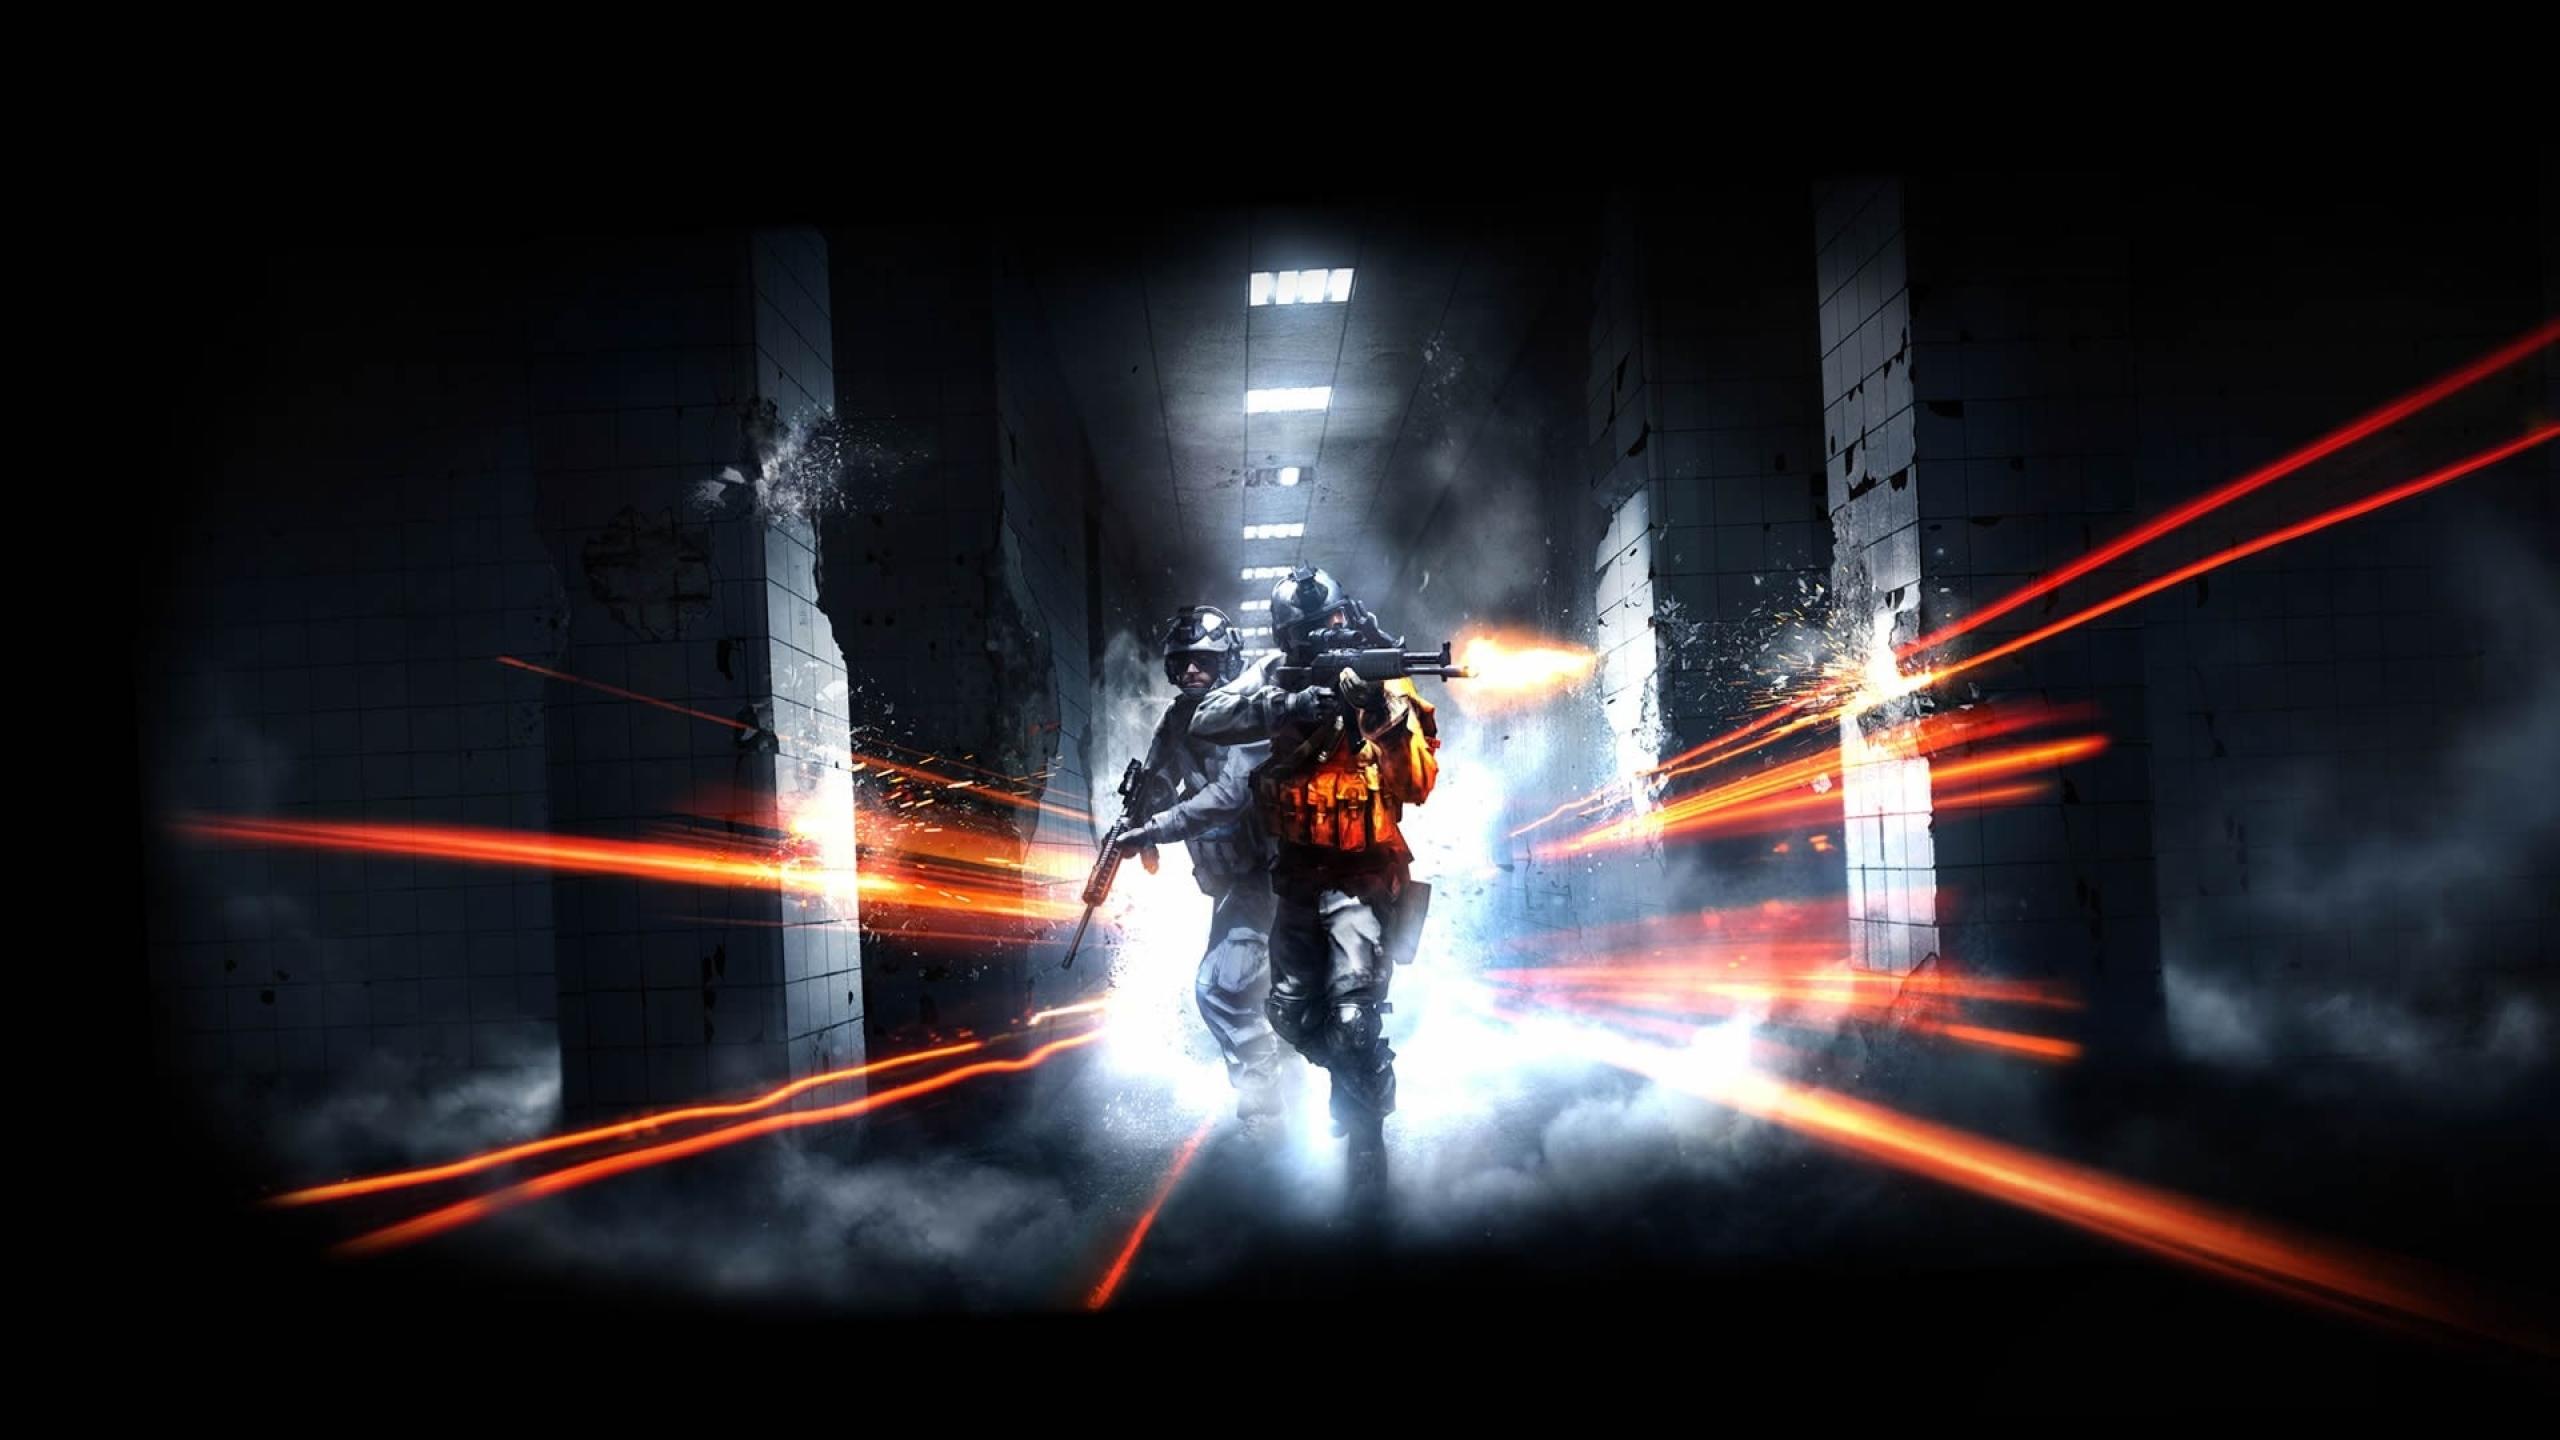 2560x1440 video games battlefield guns dice shooter fps gaming 2560x1440